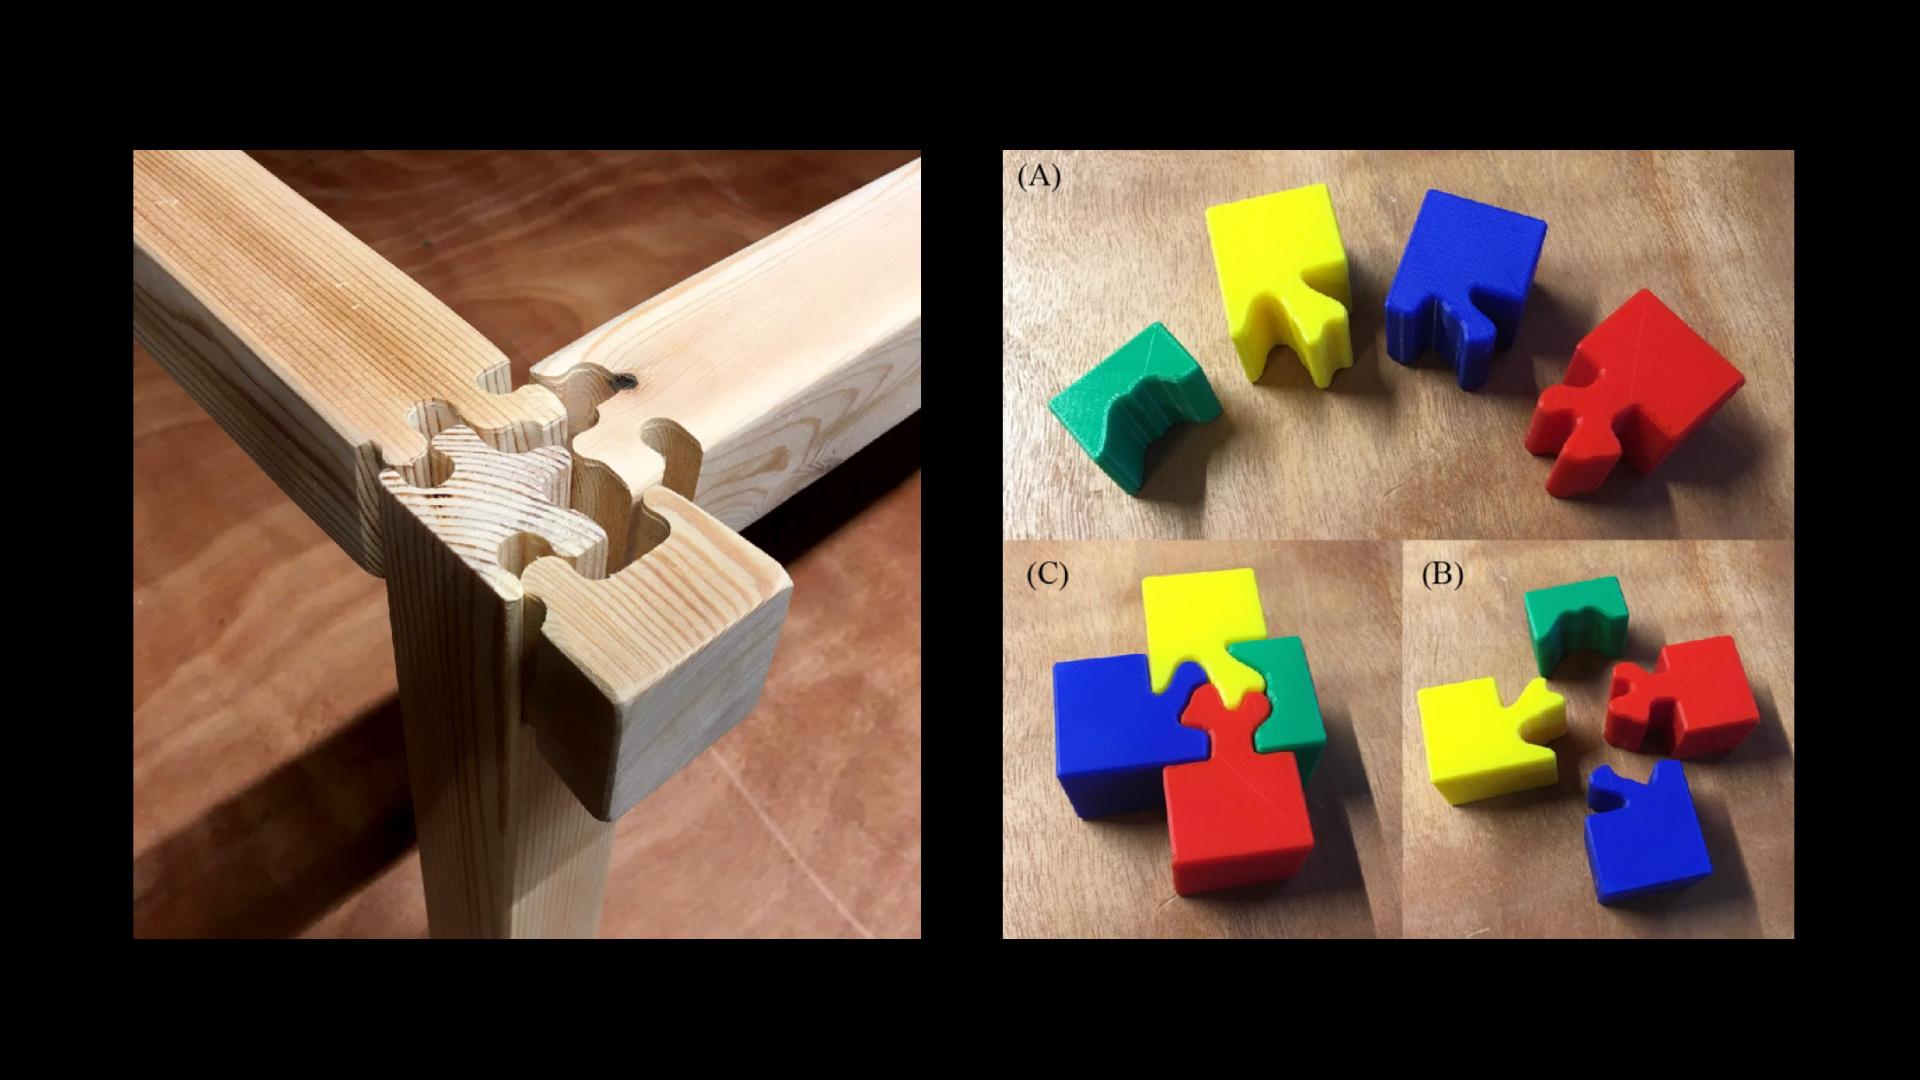 New study examines topology optimization of rigid interlocking assemblies